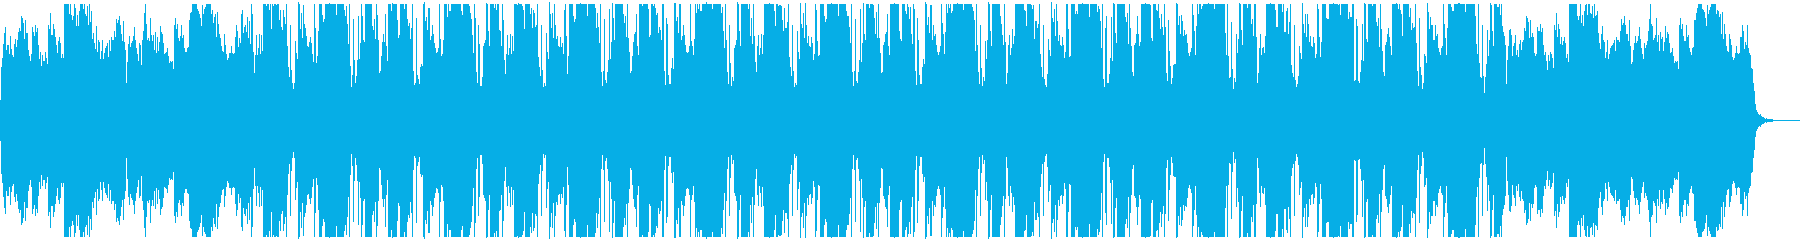 Lo-Fi Hip Hop2(ノイズ無)の再生済みの波形